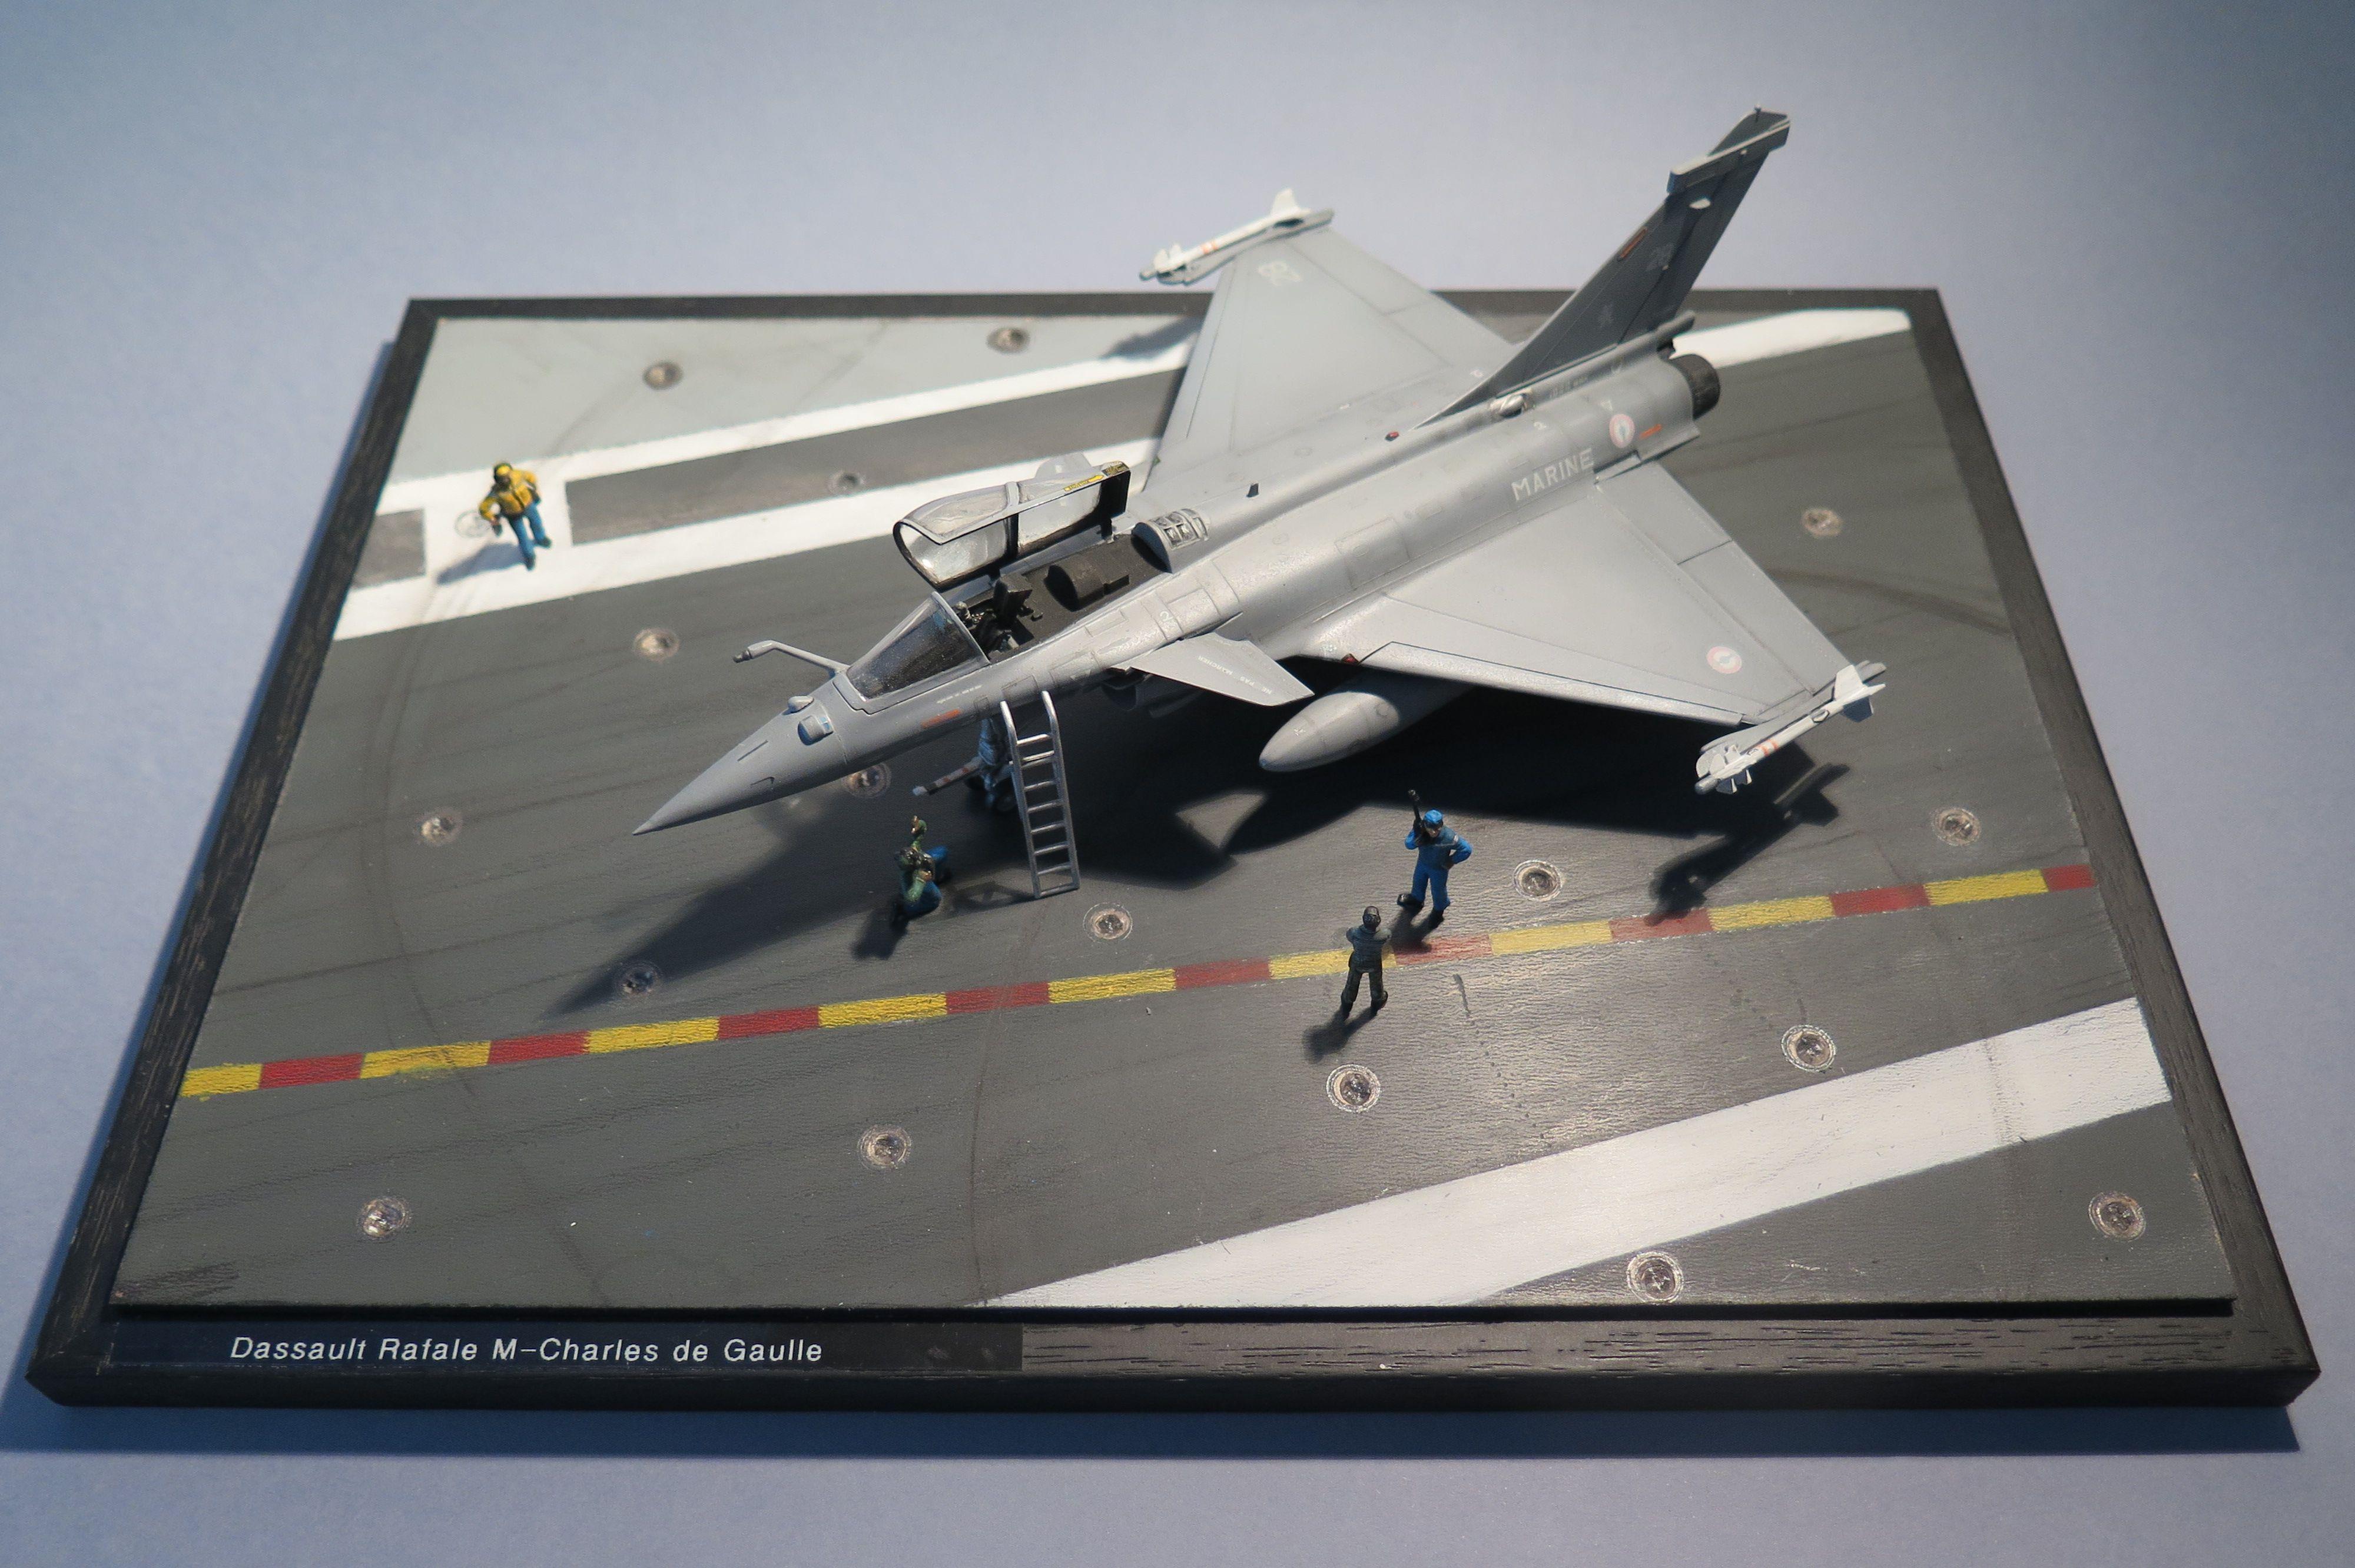 Dassault Rafale M 1/72 - Italeri   French Rafael   Fighter